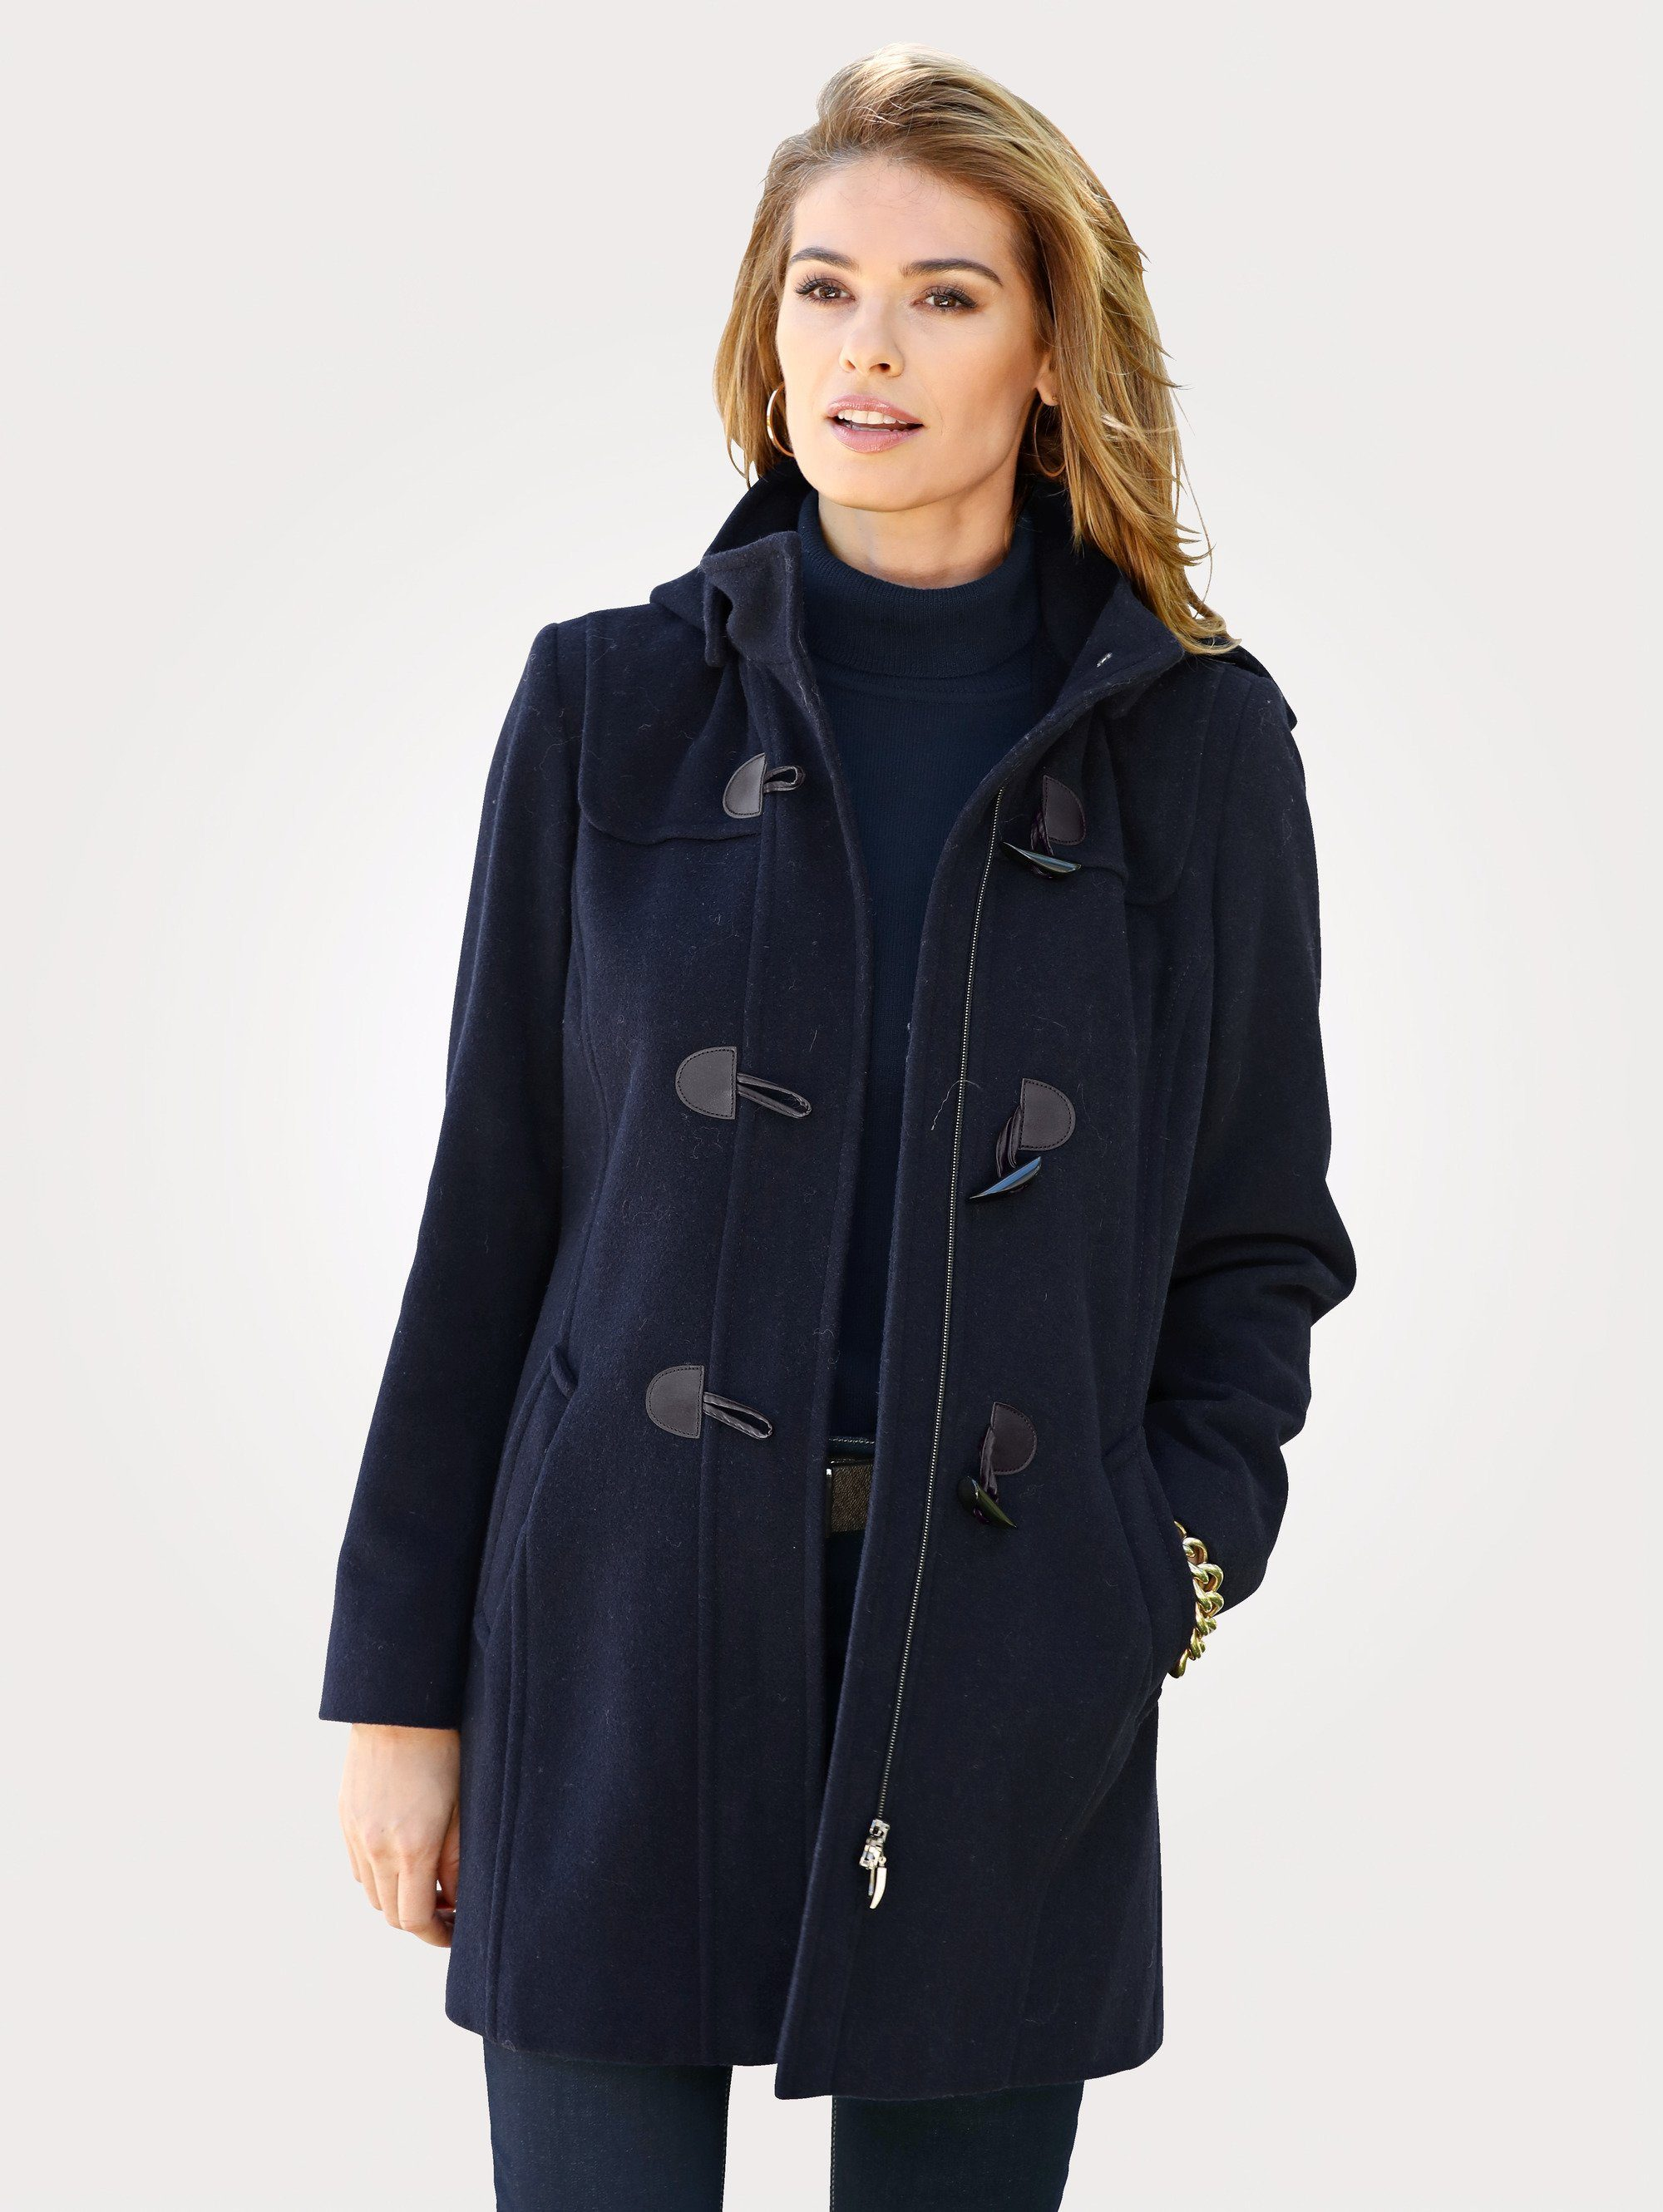 Mona Dufflecoat mit Kapuze   Bekleidung > Mäntel > Dufflecoats   Blau   Wolle - Polyester - Kaschmir   MONA